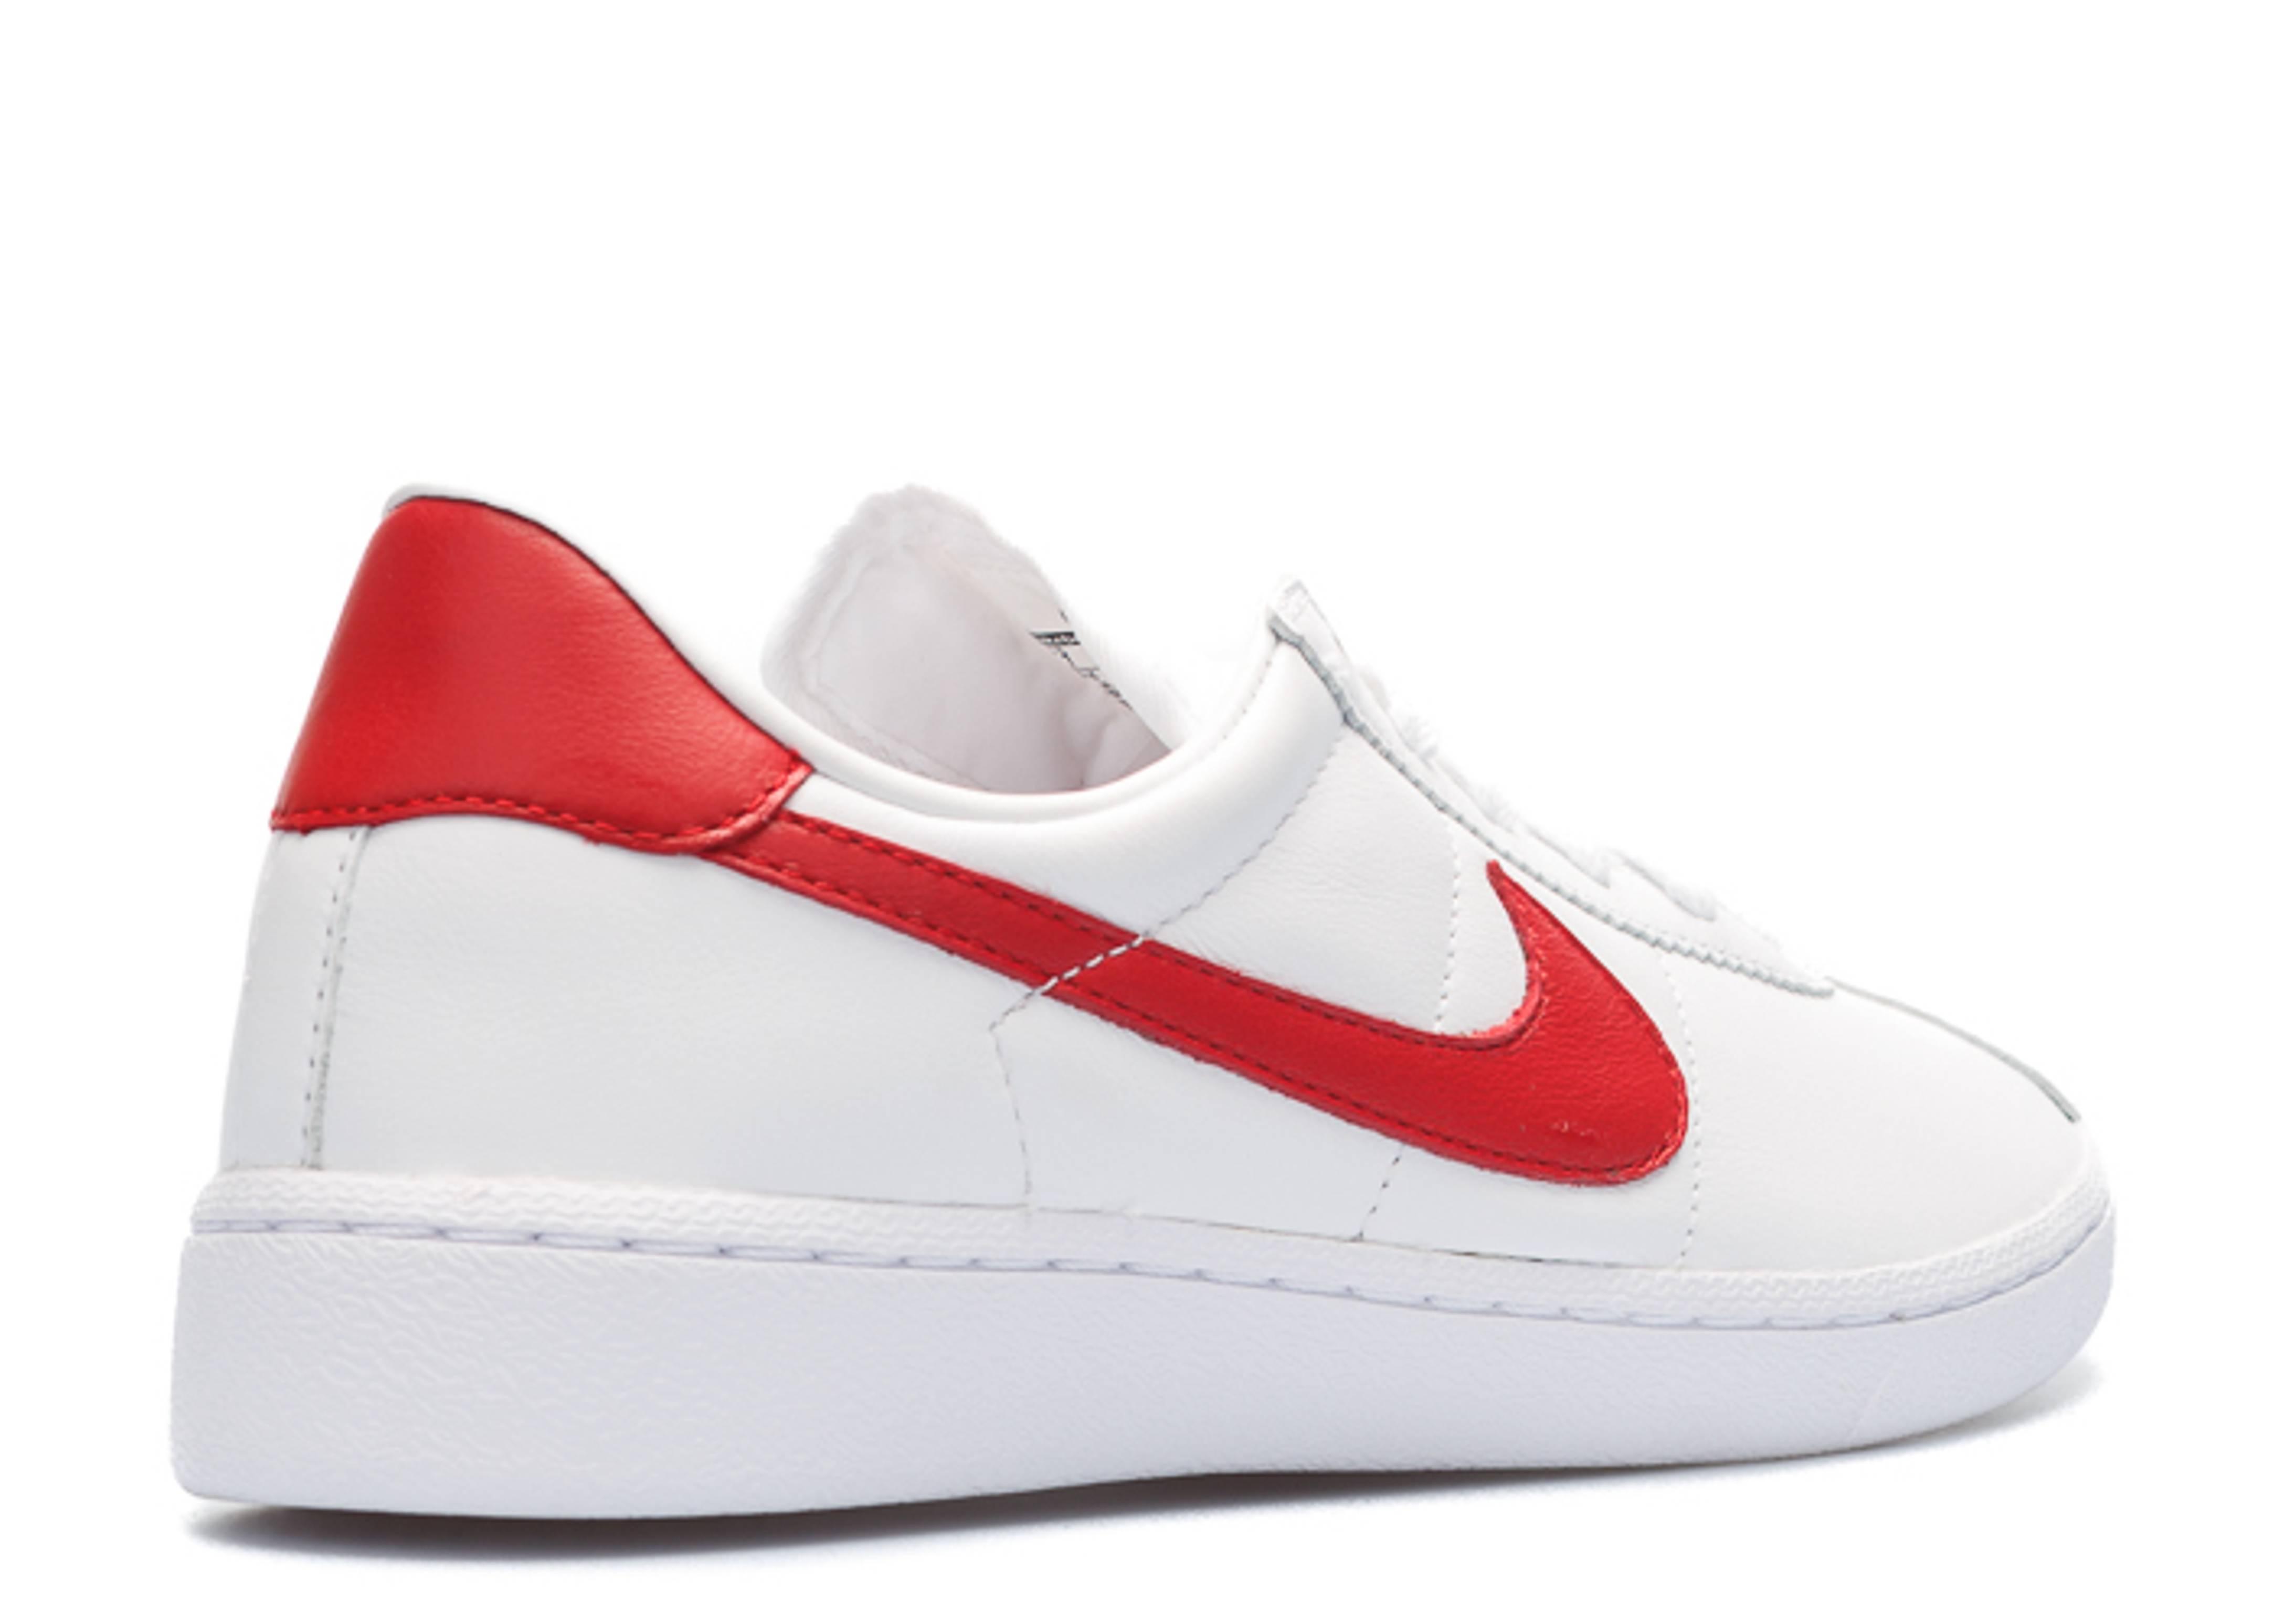 Oso Miniatura escaramuza  NikeLab Bruin 'Marty McFly' - Nike - 826670 160 - white/gym red   Flight  Club